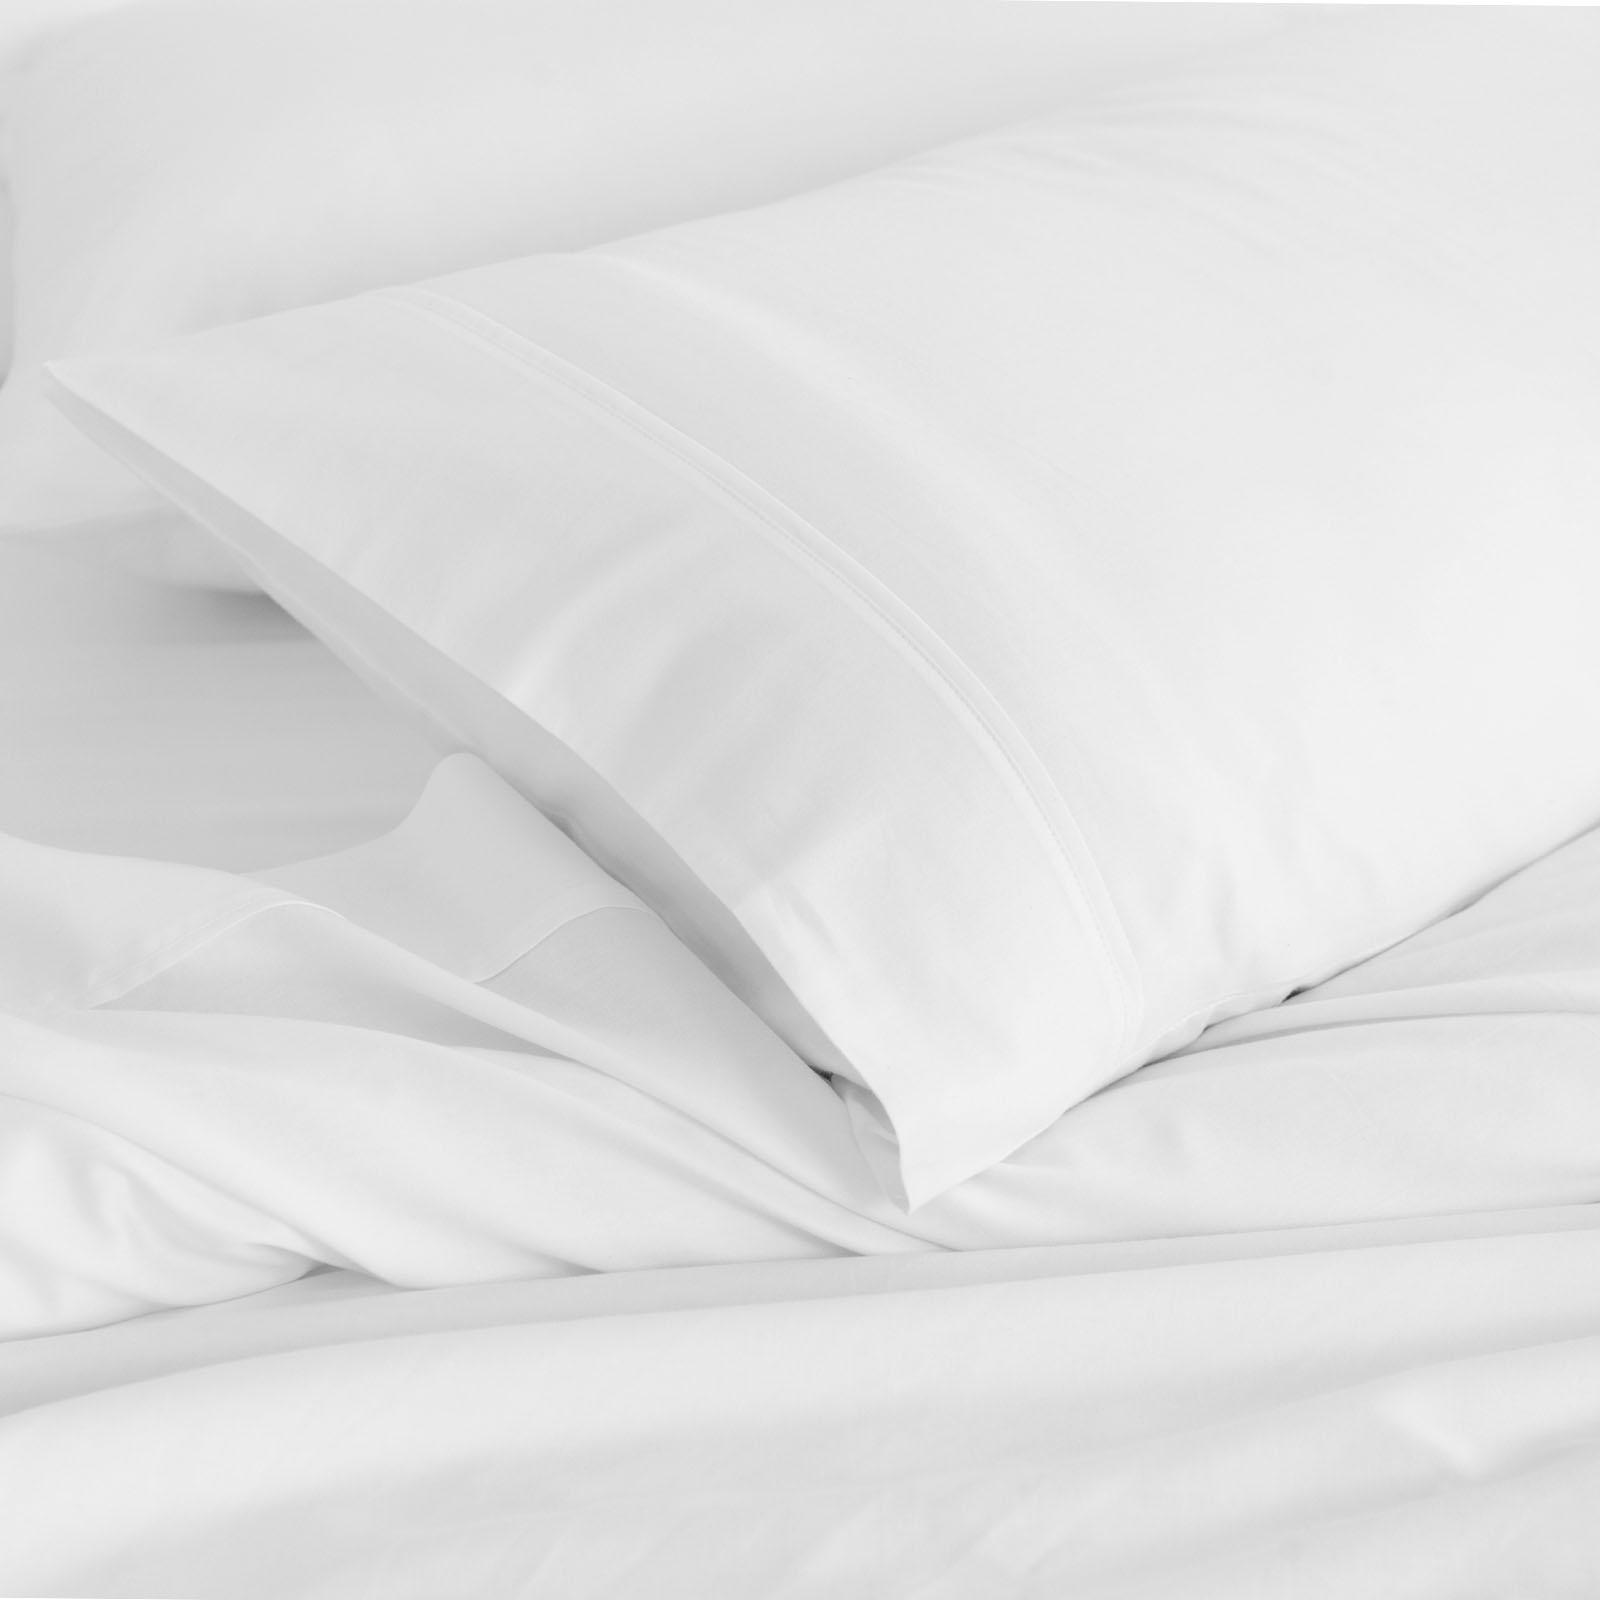 thumbnail 44 - Royal Comfort 1000TC Hotel Grade Bamboo Cotton Sheets Pillowcases Set Ultrasoft